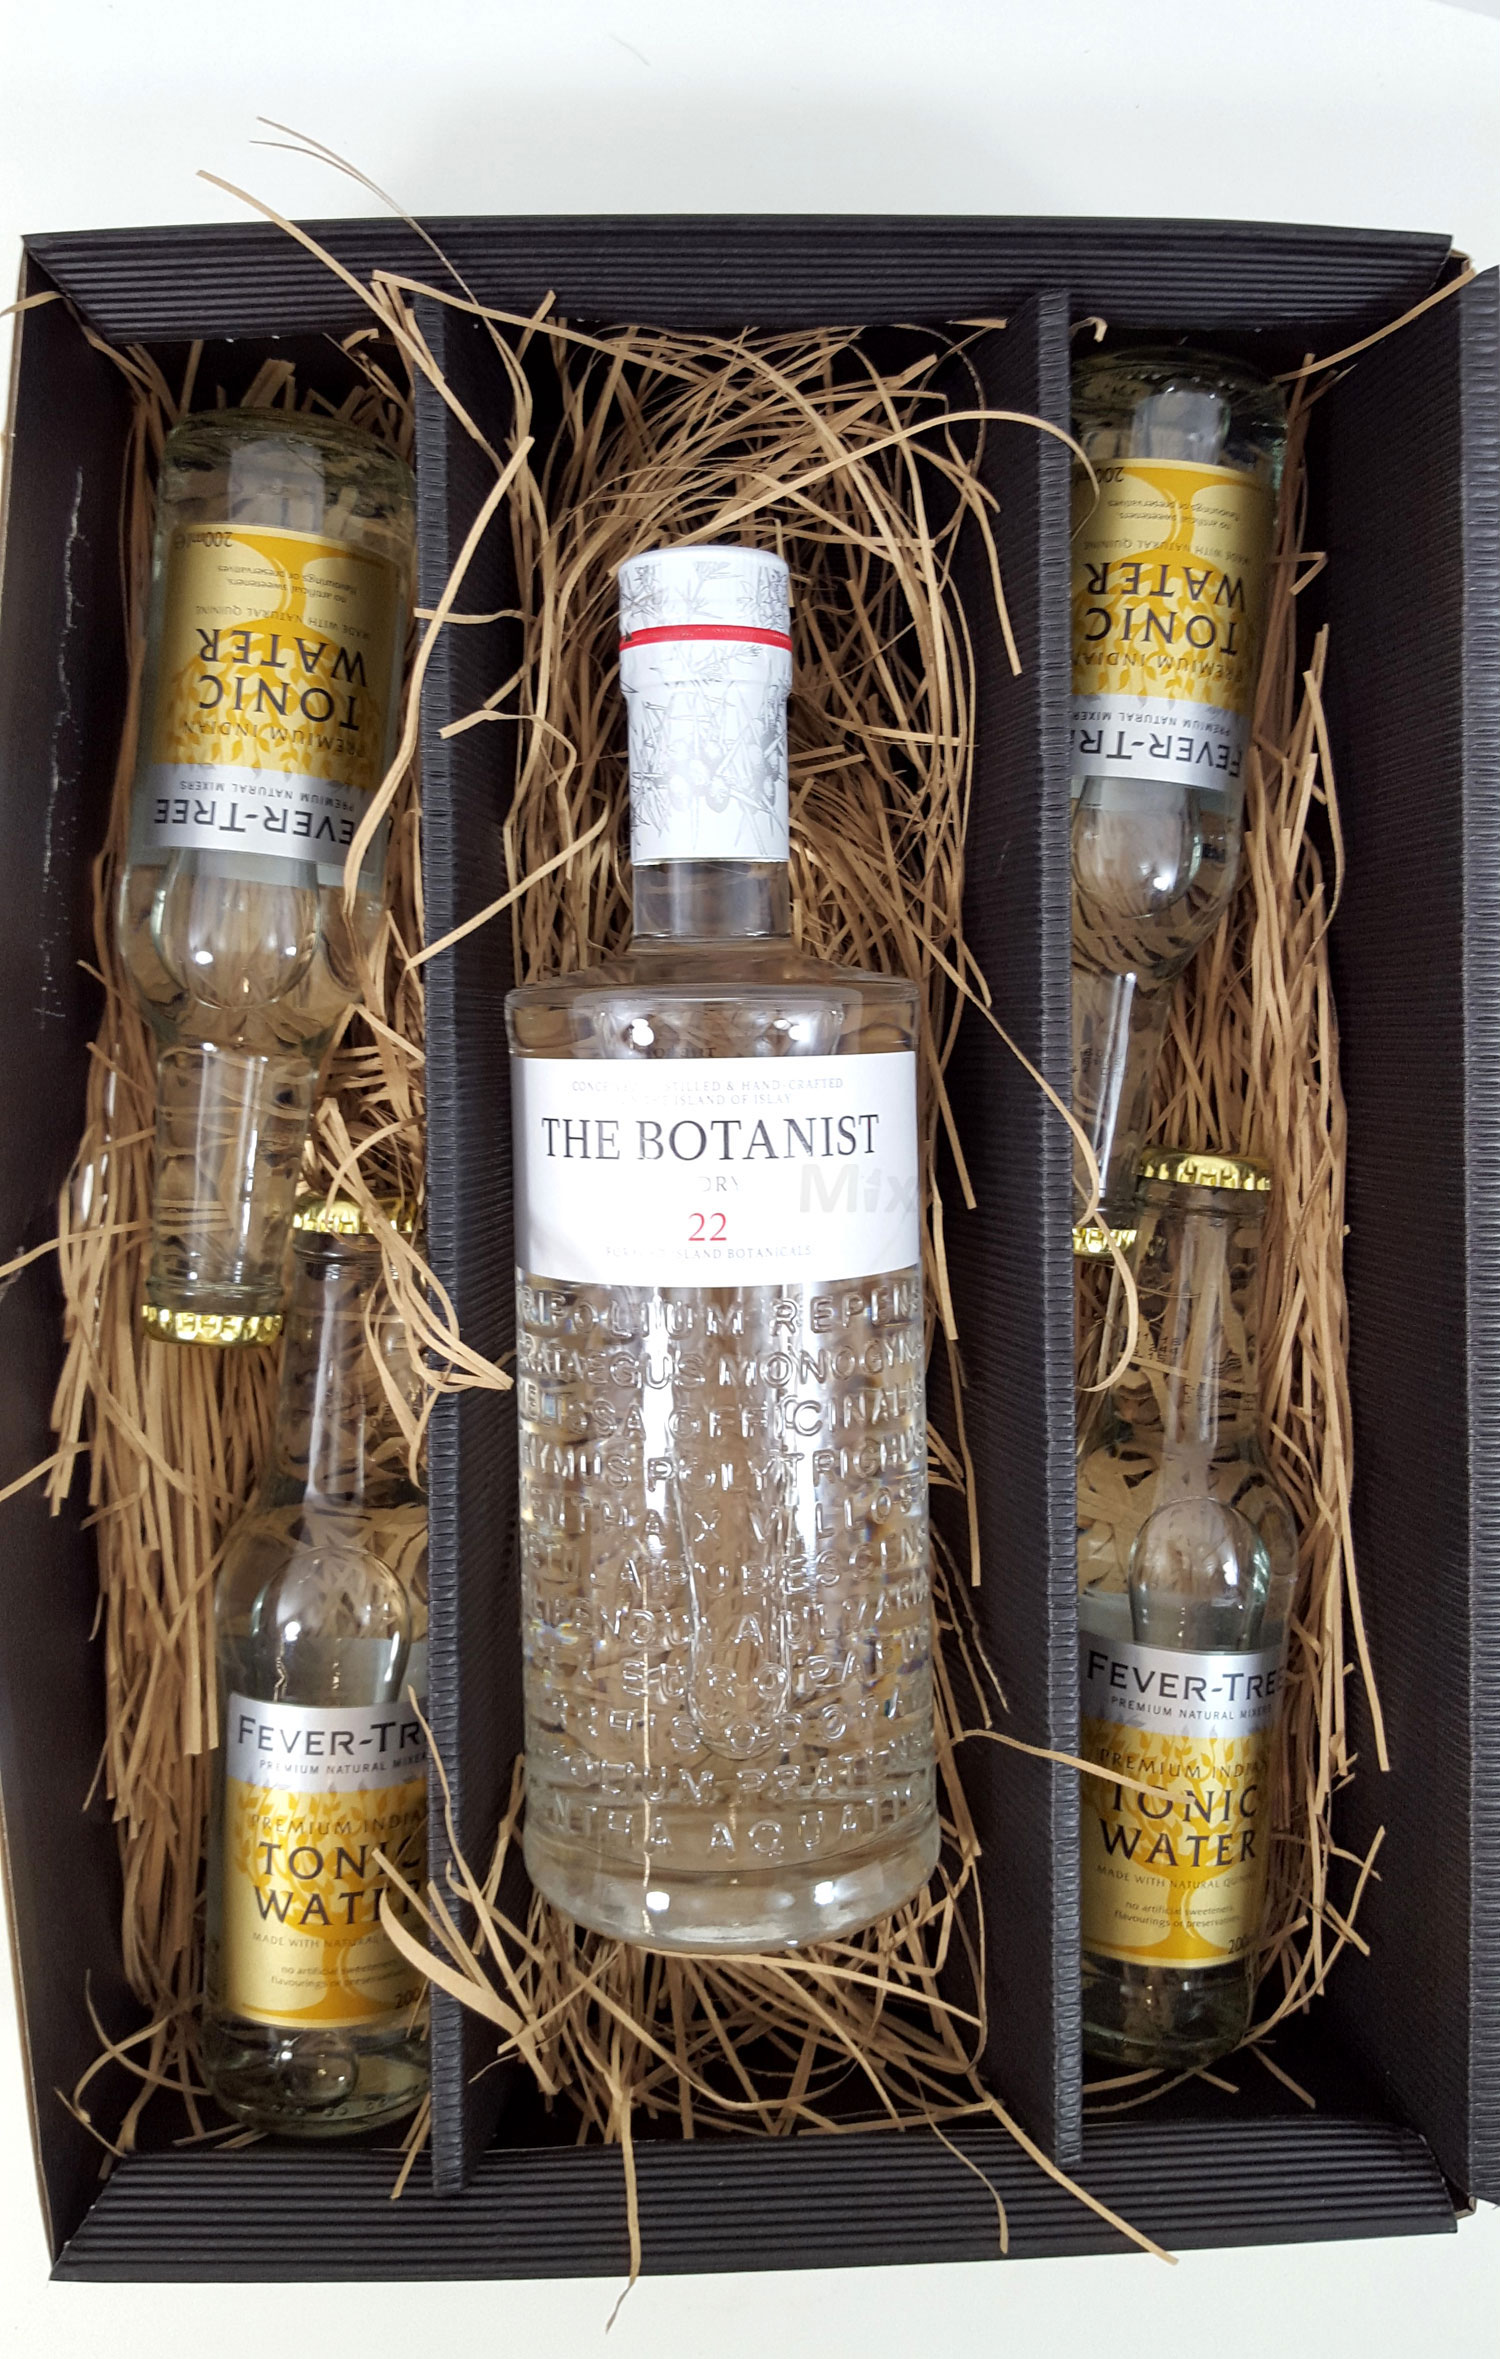 Gin Tonic Set / Geschenkset - The Botanist Islay Dry Gin 0,7l 700ml (46% Vol) + 4x Fever-Tree Tonic Water 200ml - Inkl. Pfand MEHRWEG